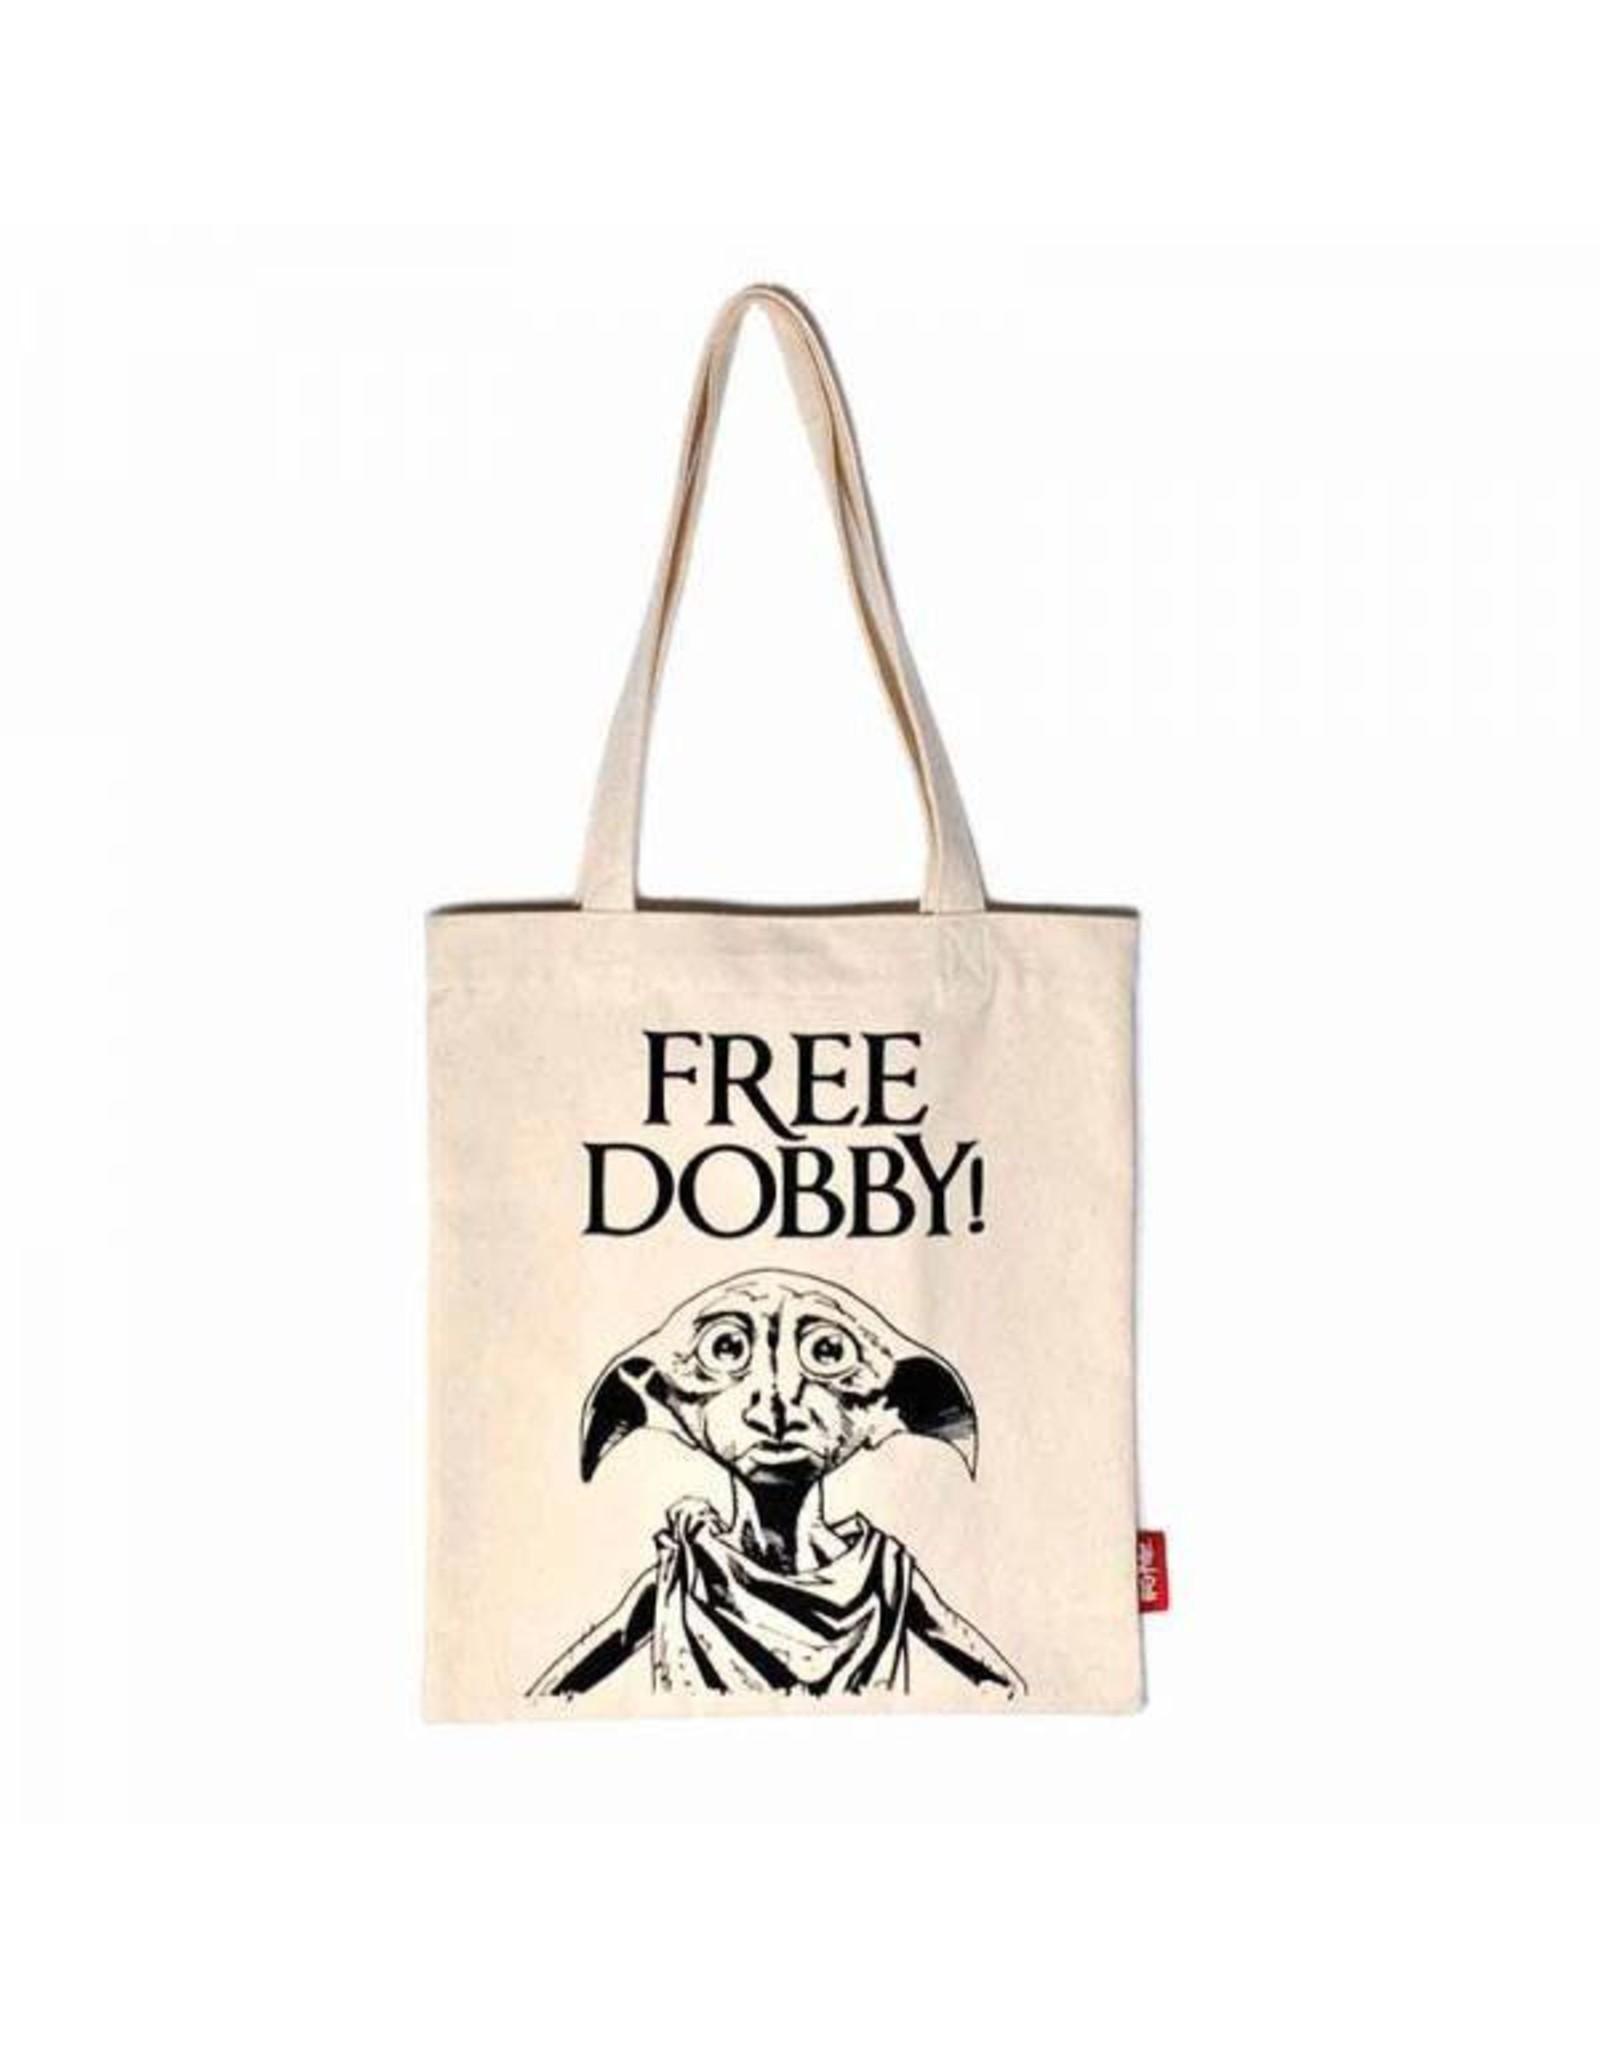 Harry Potter Harry Potter bags - Harry Potter Shopping bag Free Dobby